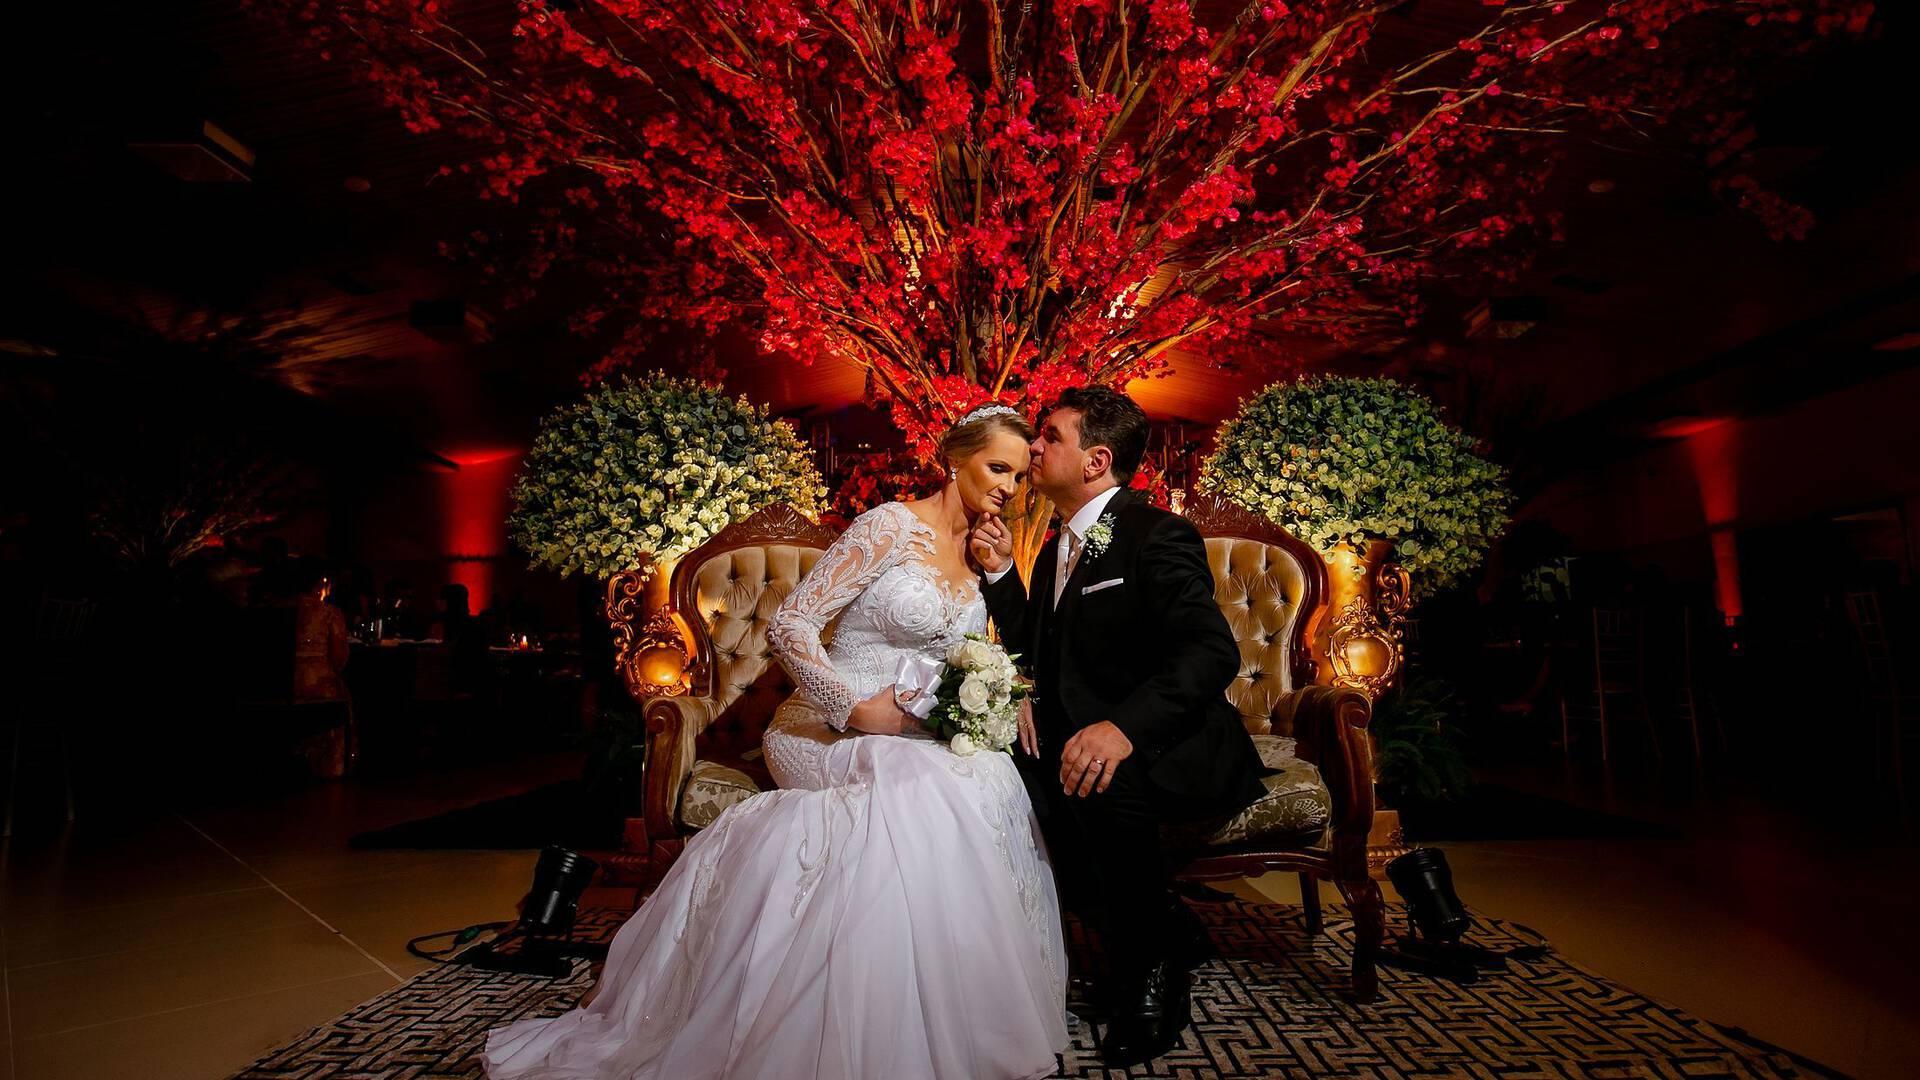 Casamento de Rosi e Clóvis